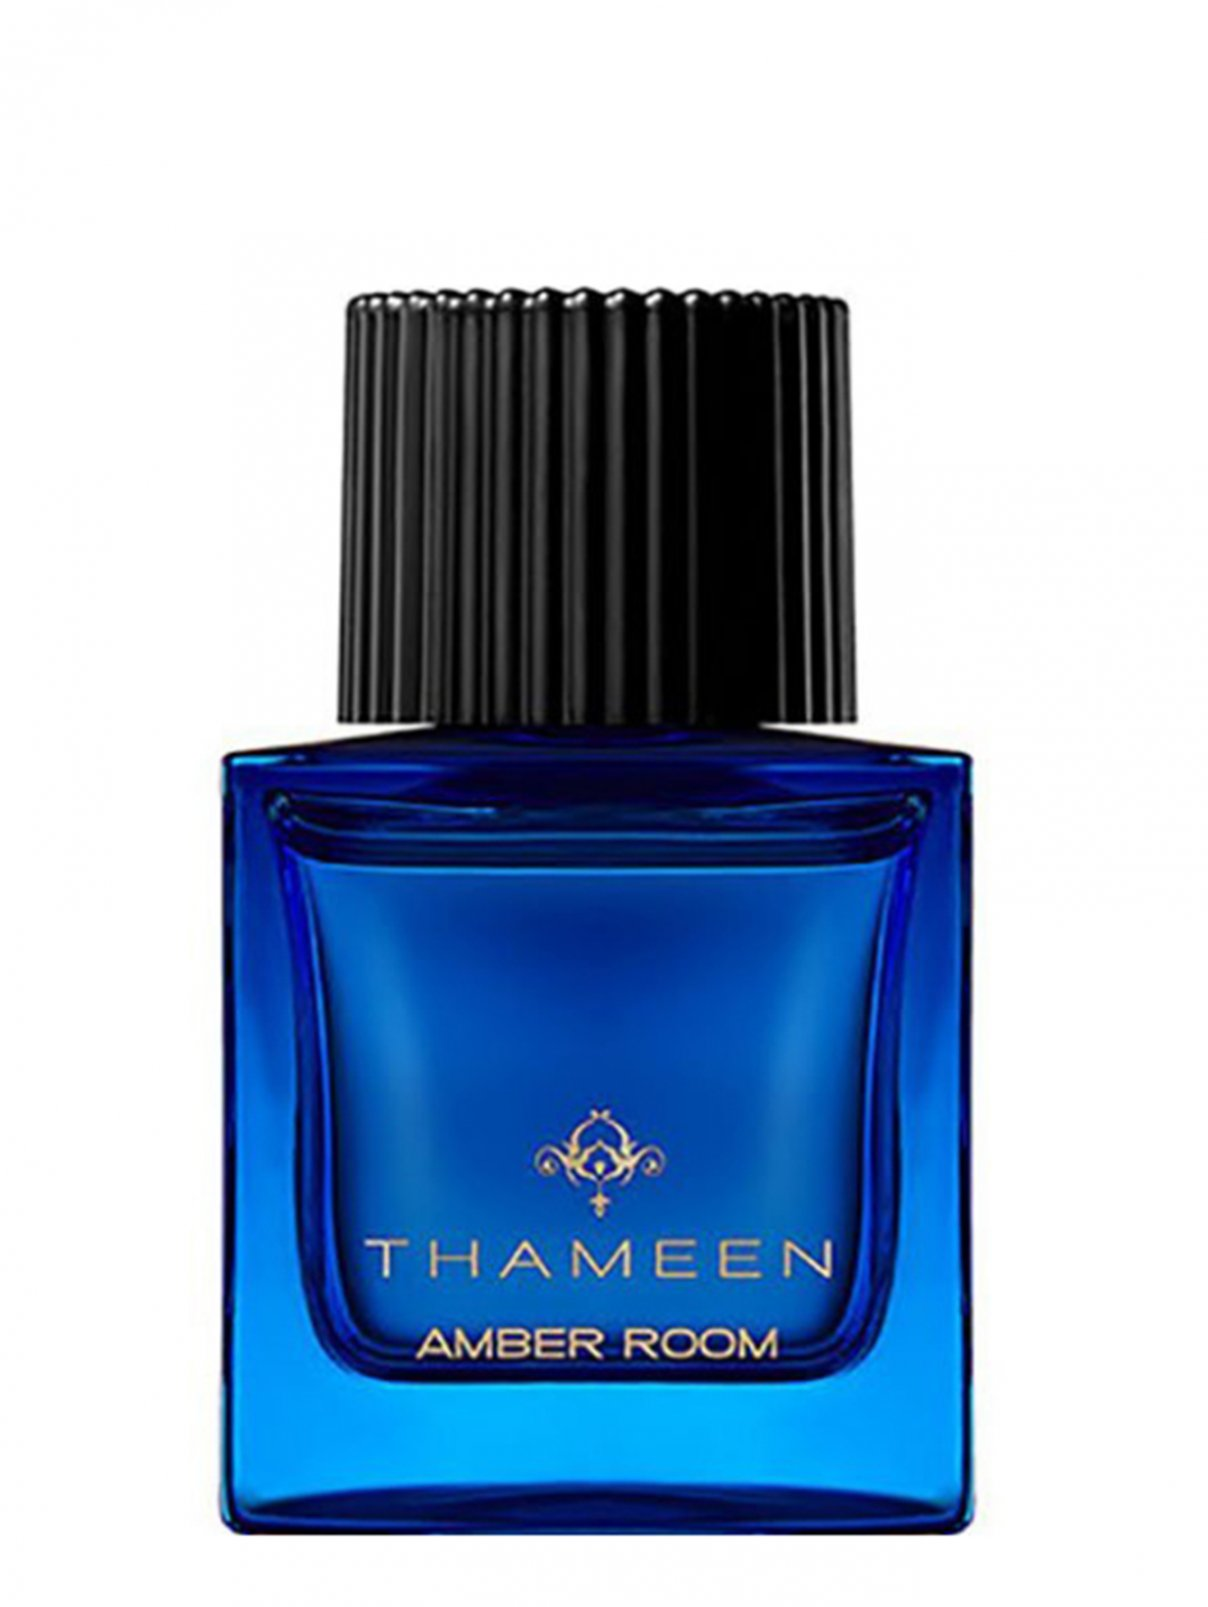 Парфюмерная вода 50 мл Amber Room Thameen London Thameen London  –  Общий вид